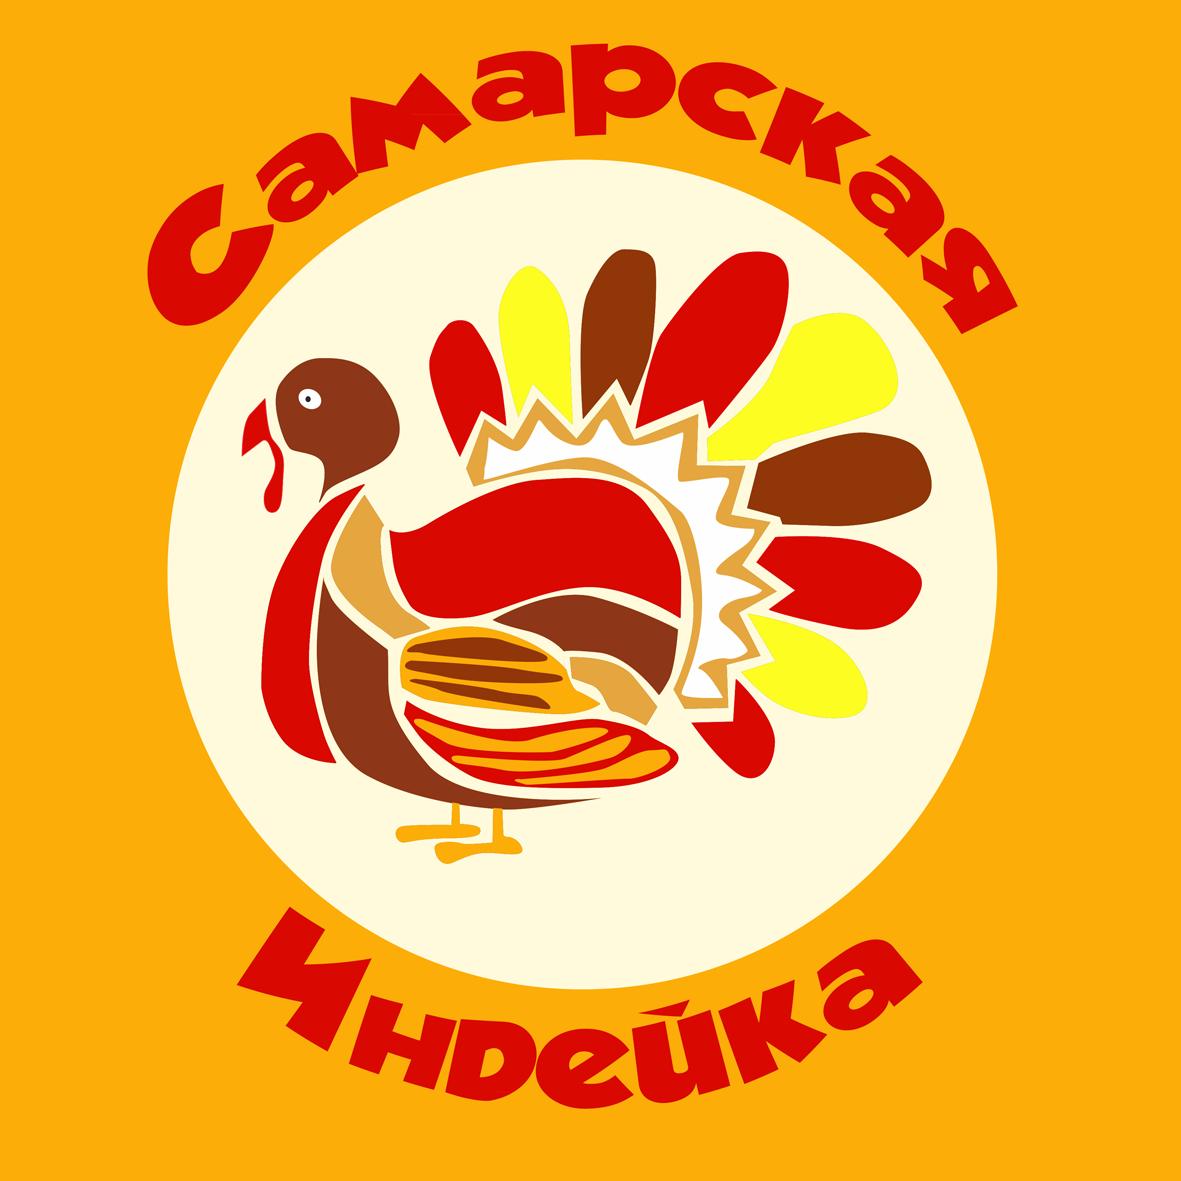 Создание логотипа Сельхоз производителя фото f_26455e03cd7d5290.png